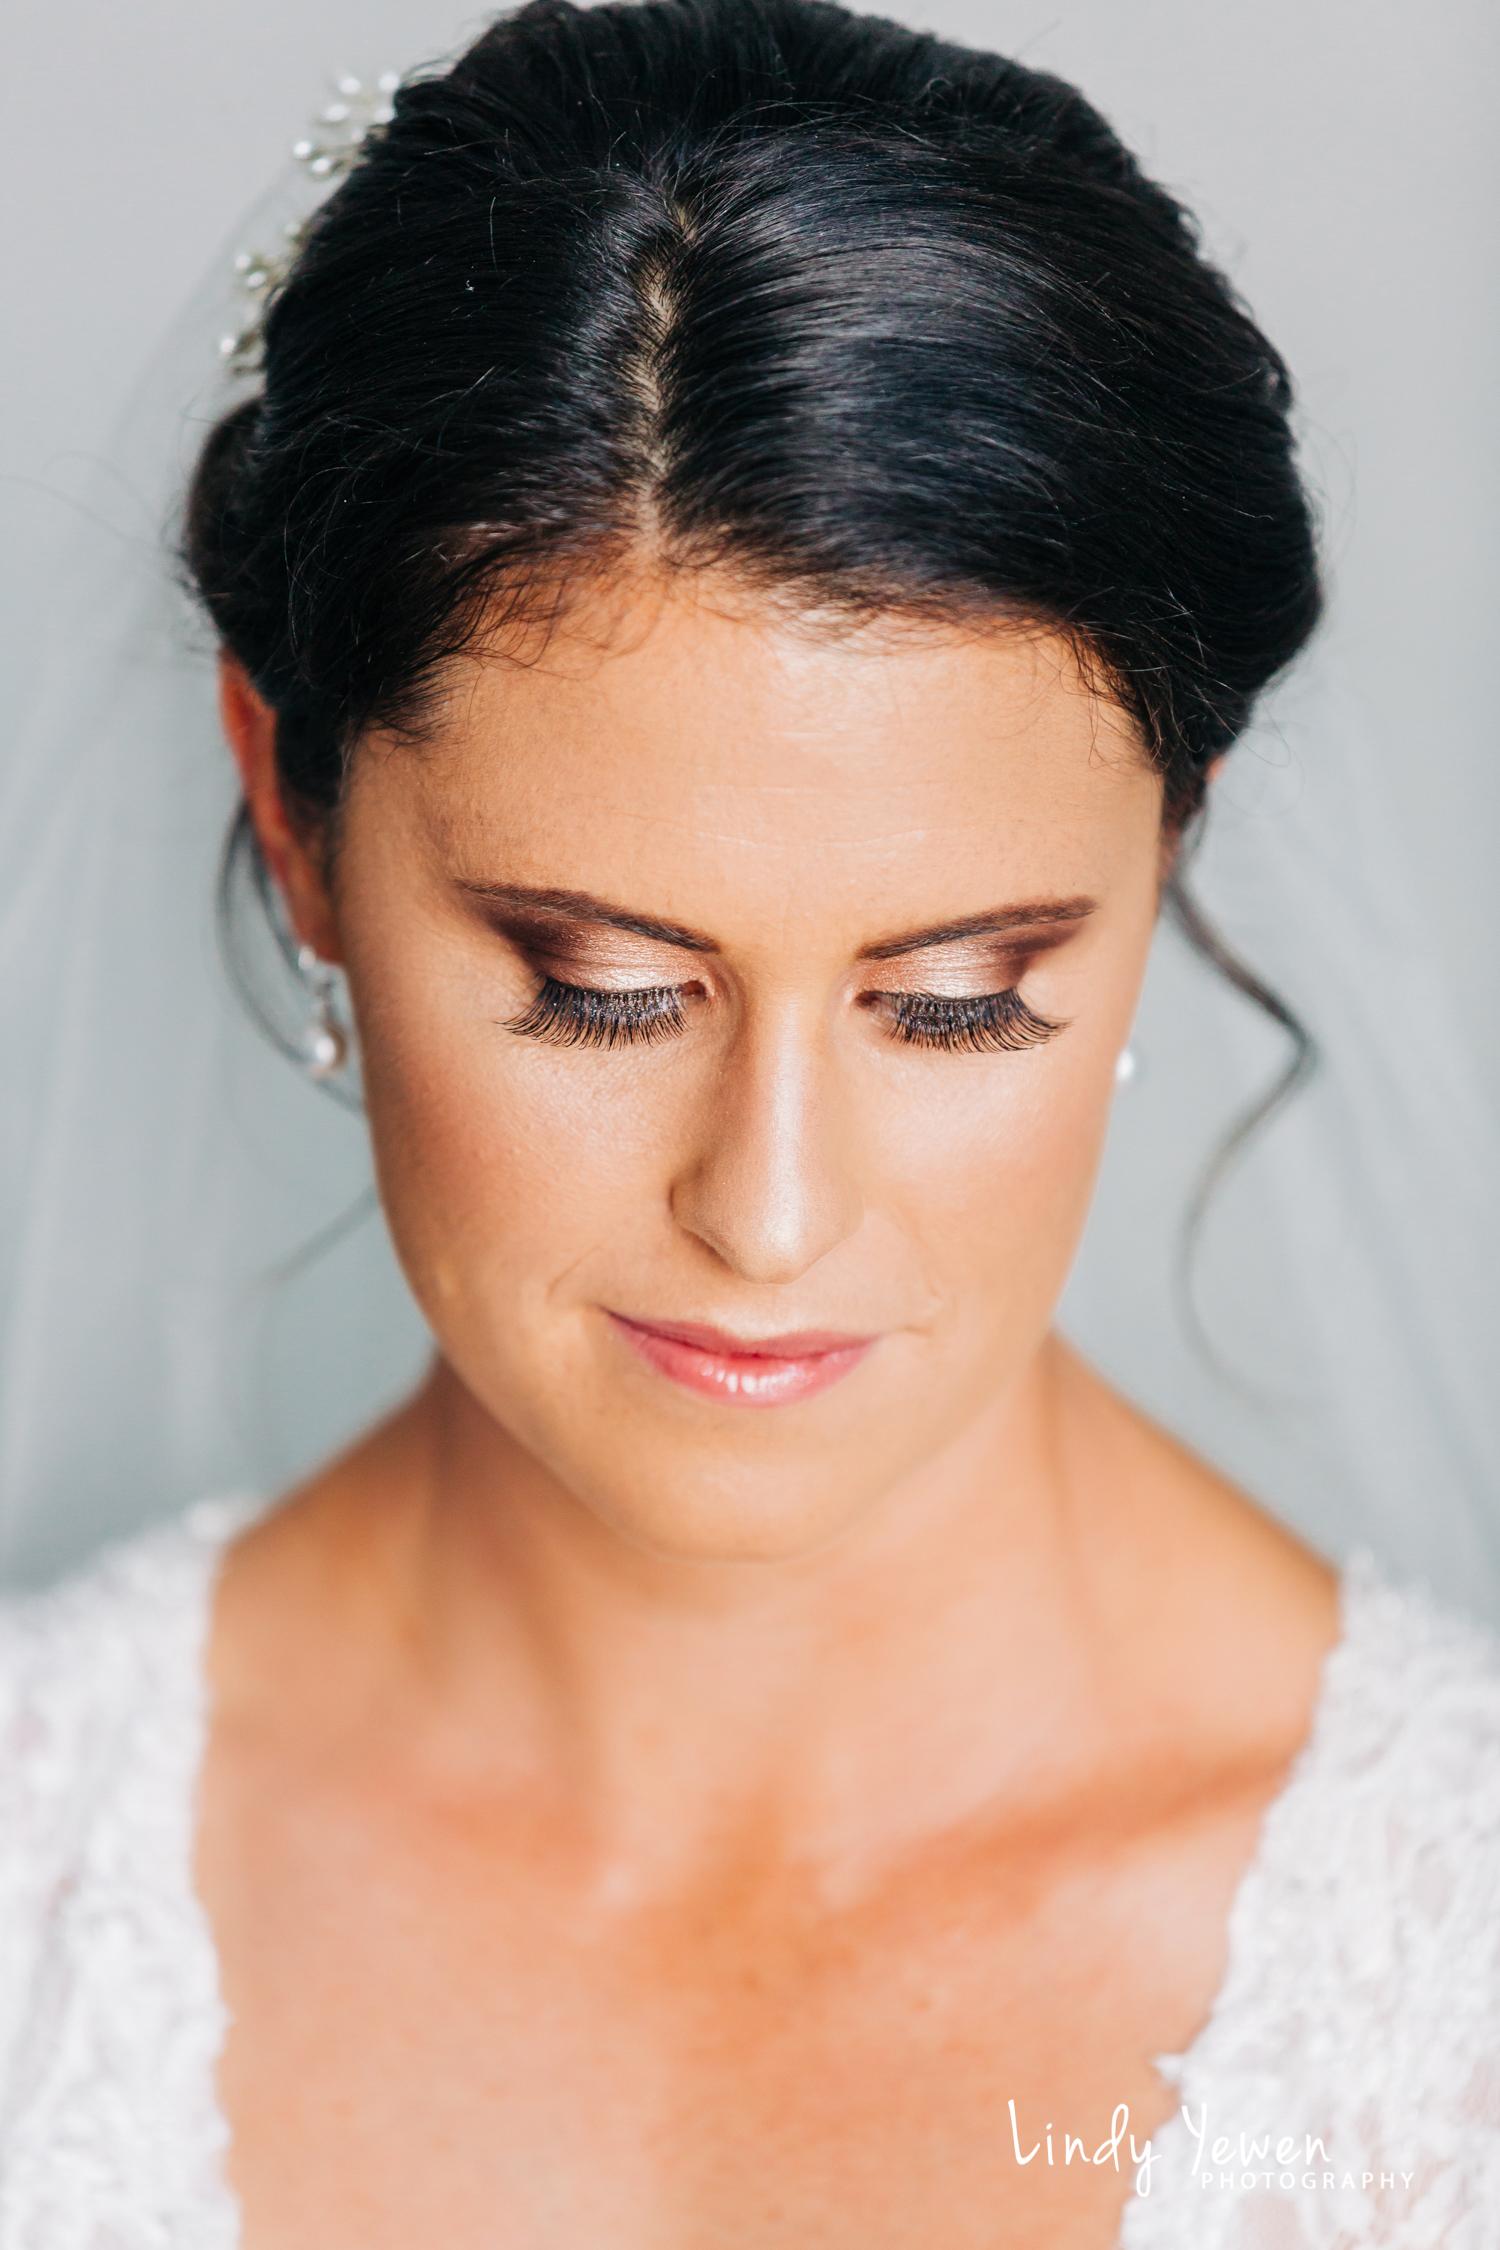 Noosa-Marina-Wedding-Nat-Natalie  66.jpg